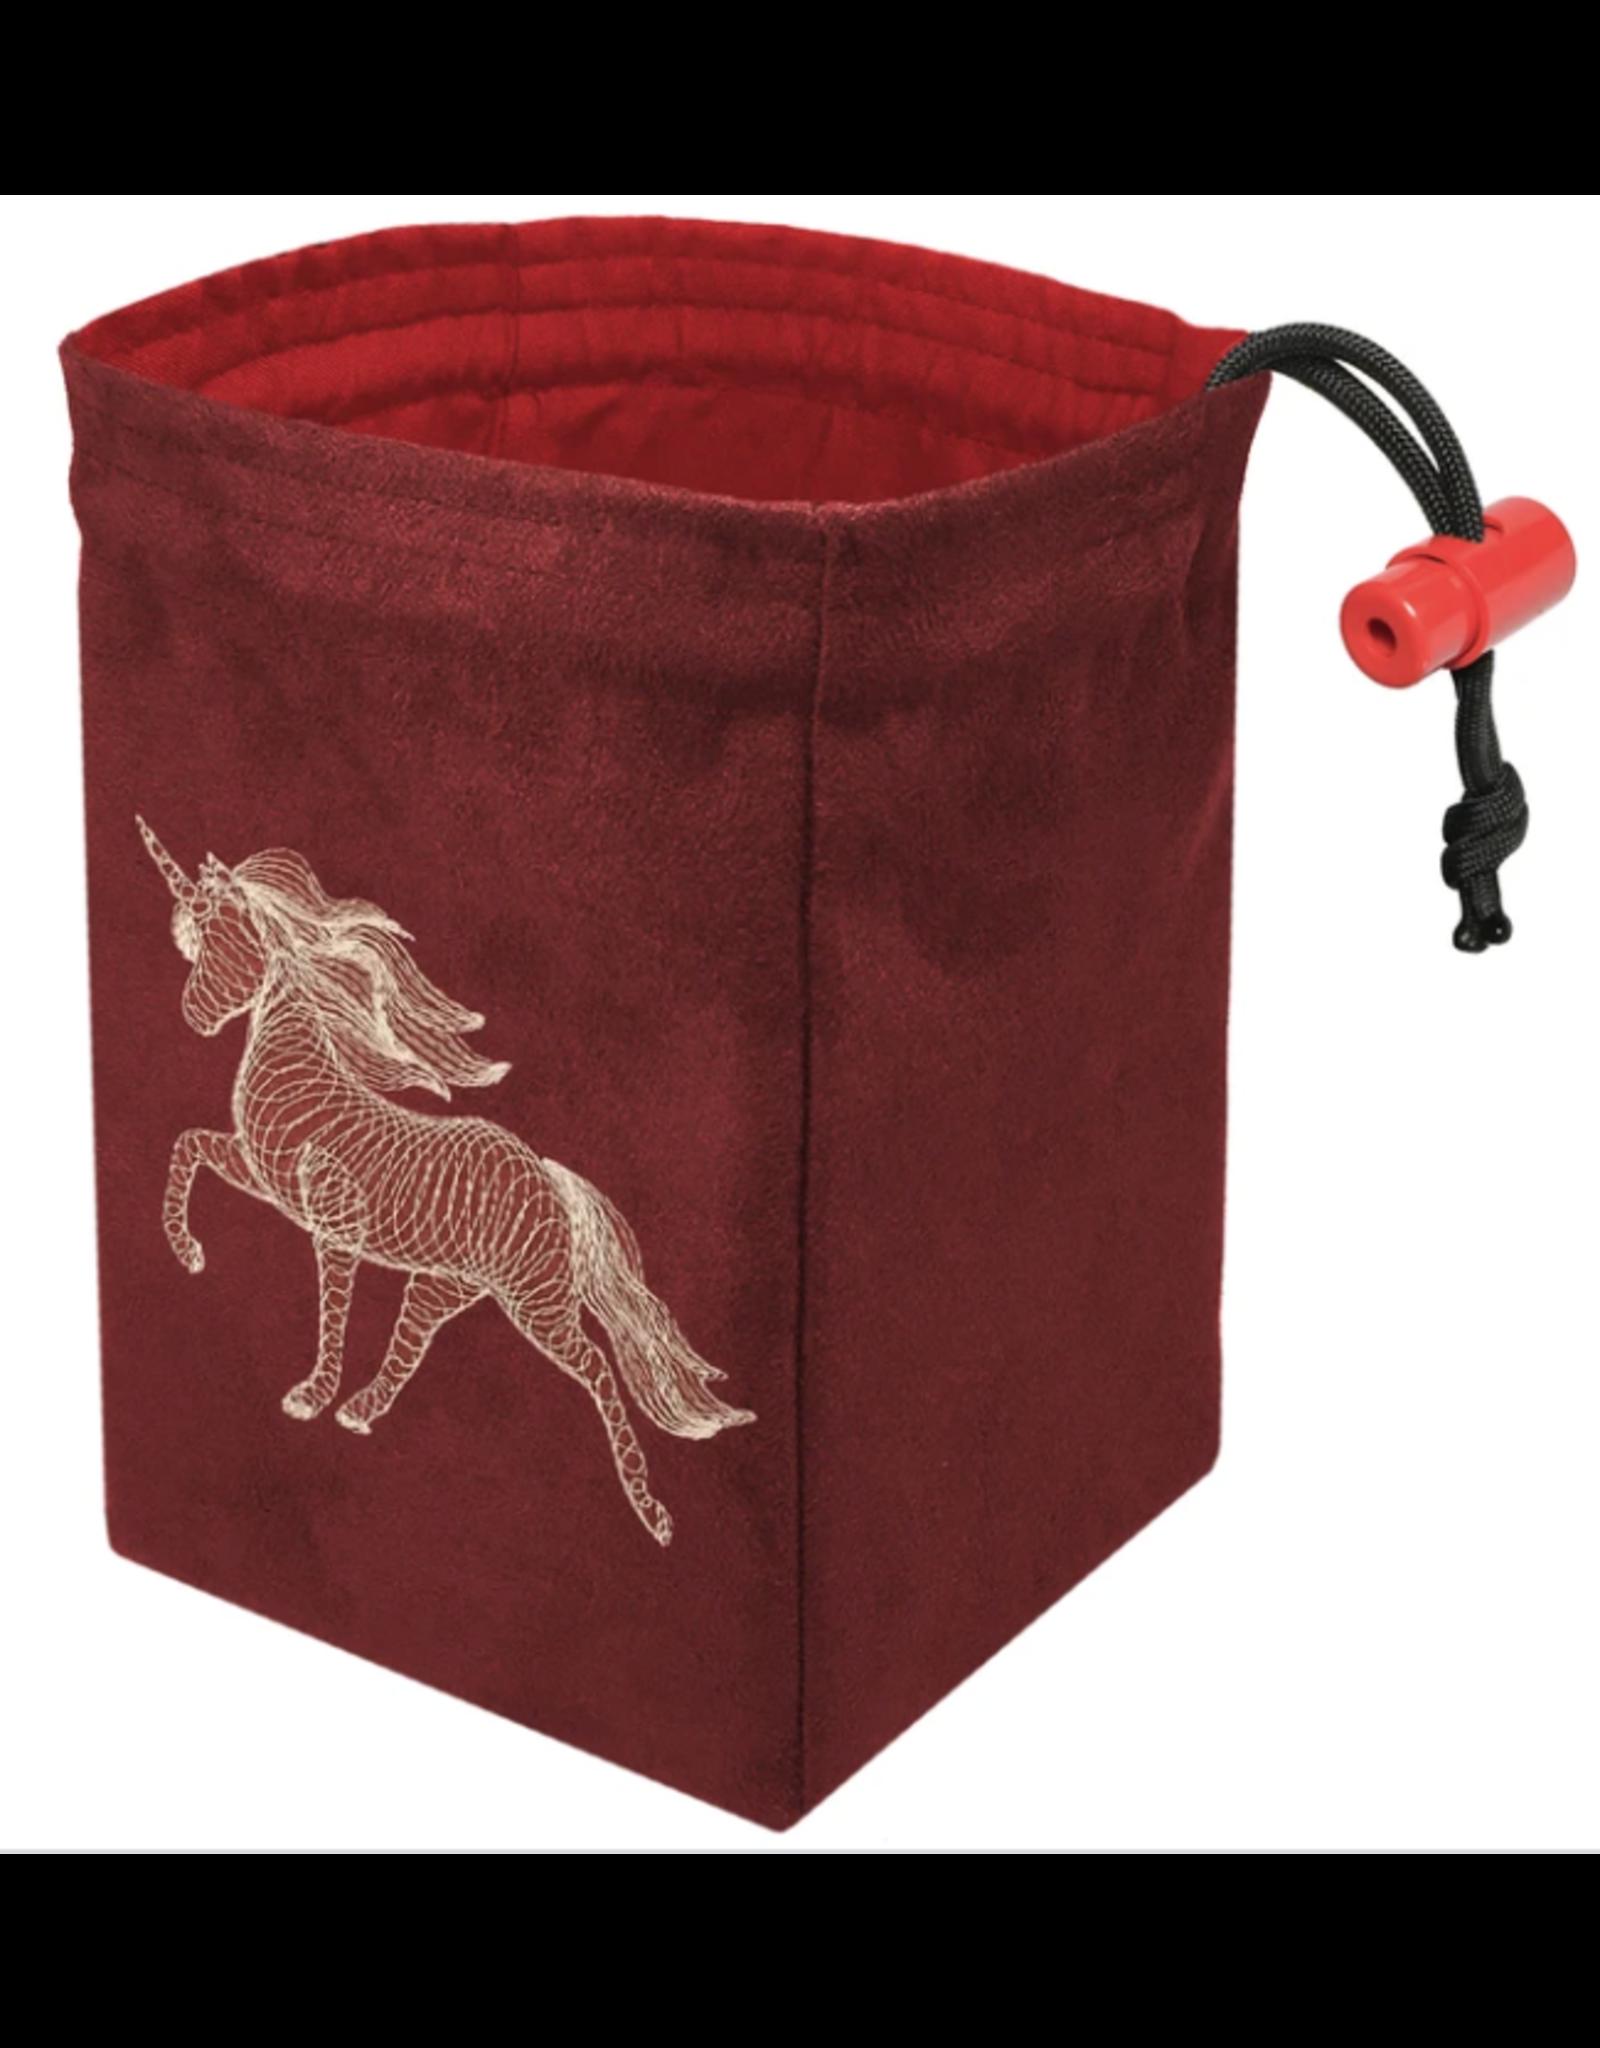 Dice Dimensional Unicorn - Embroidered Dice Bag